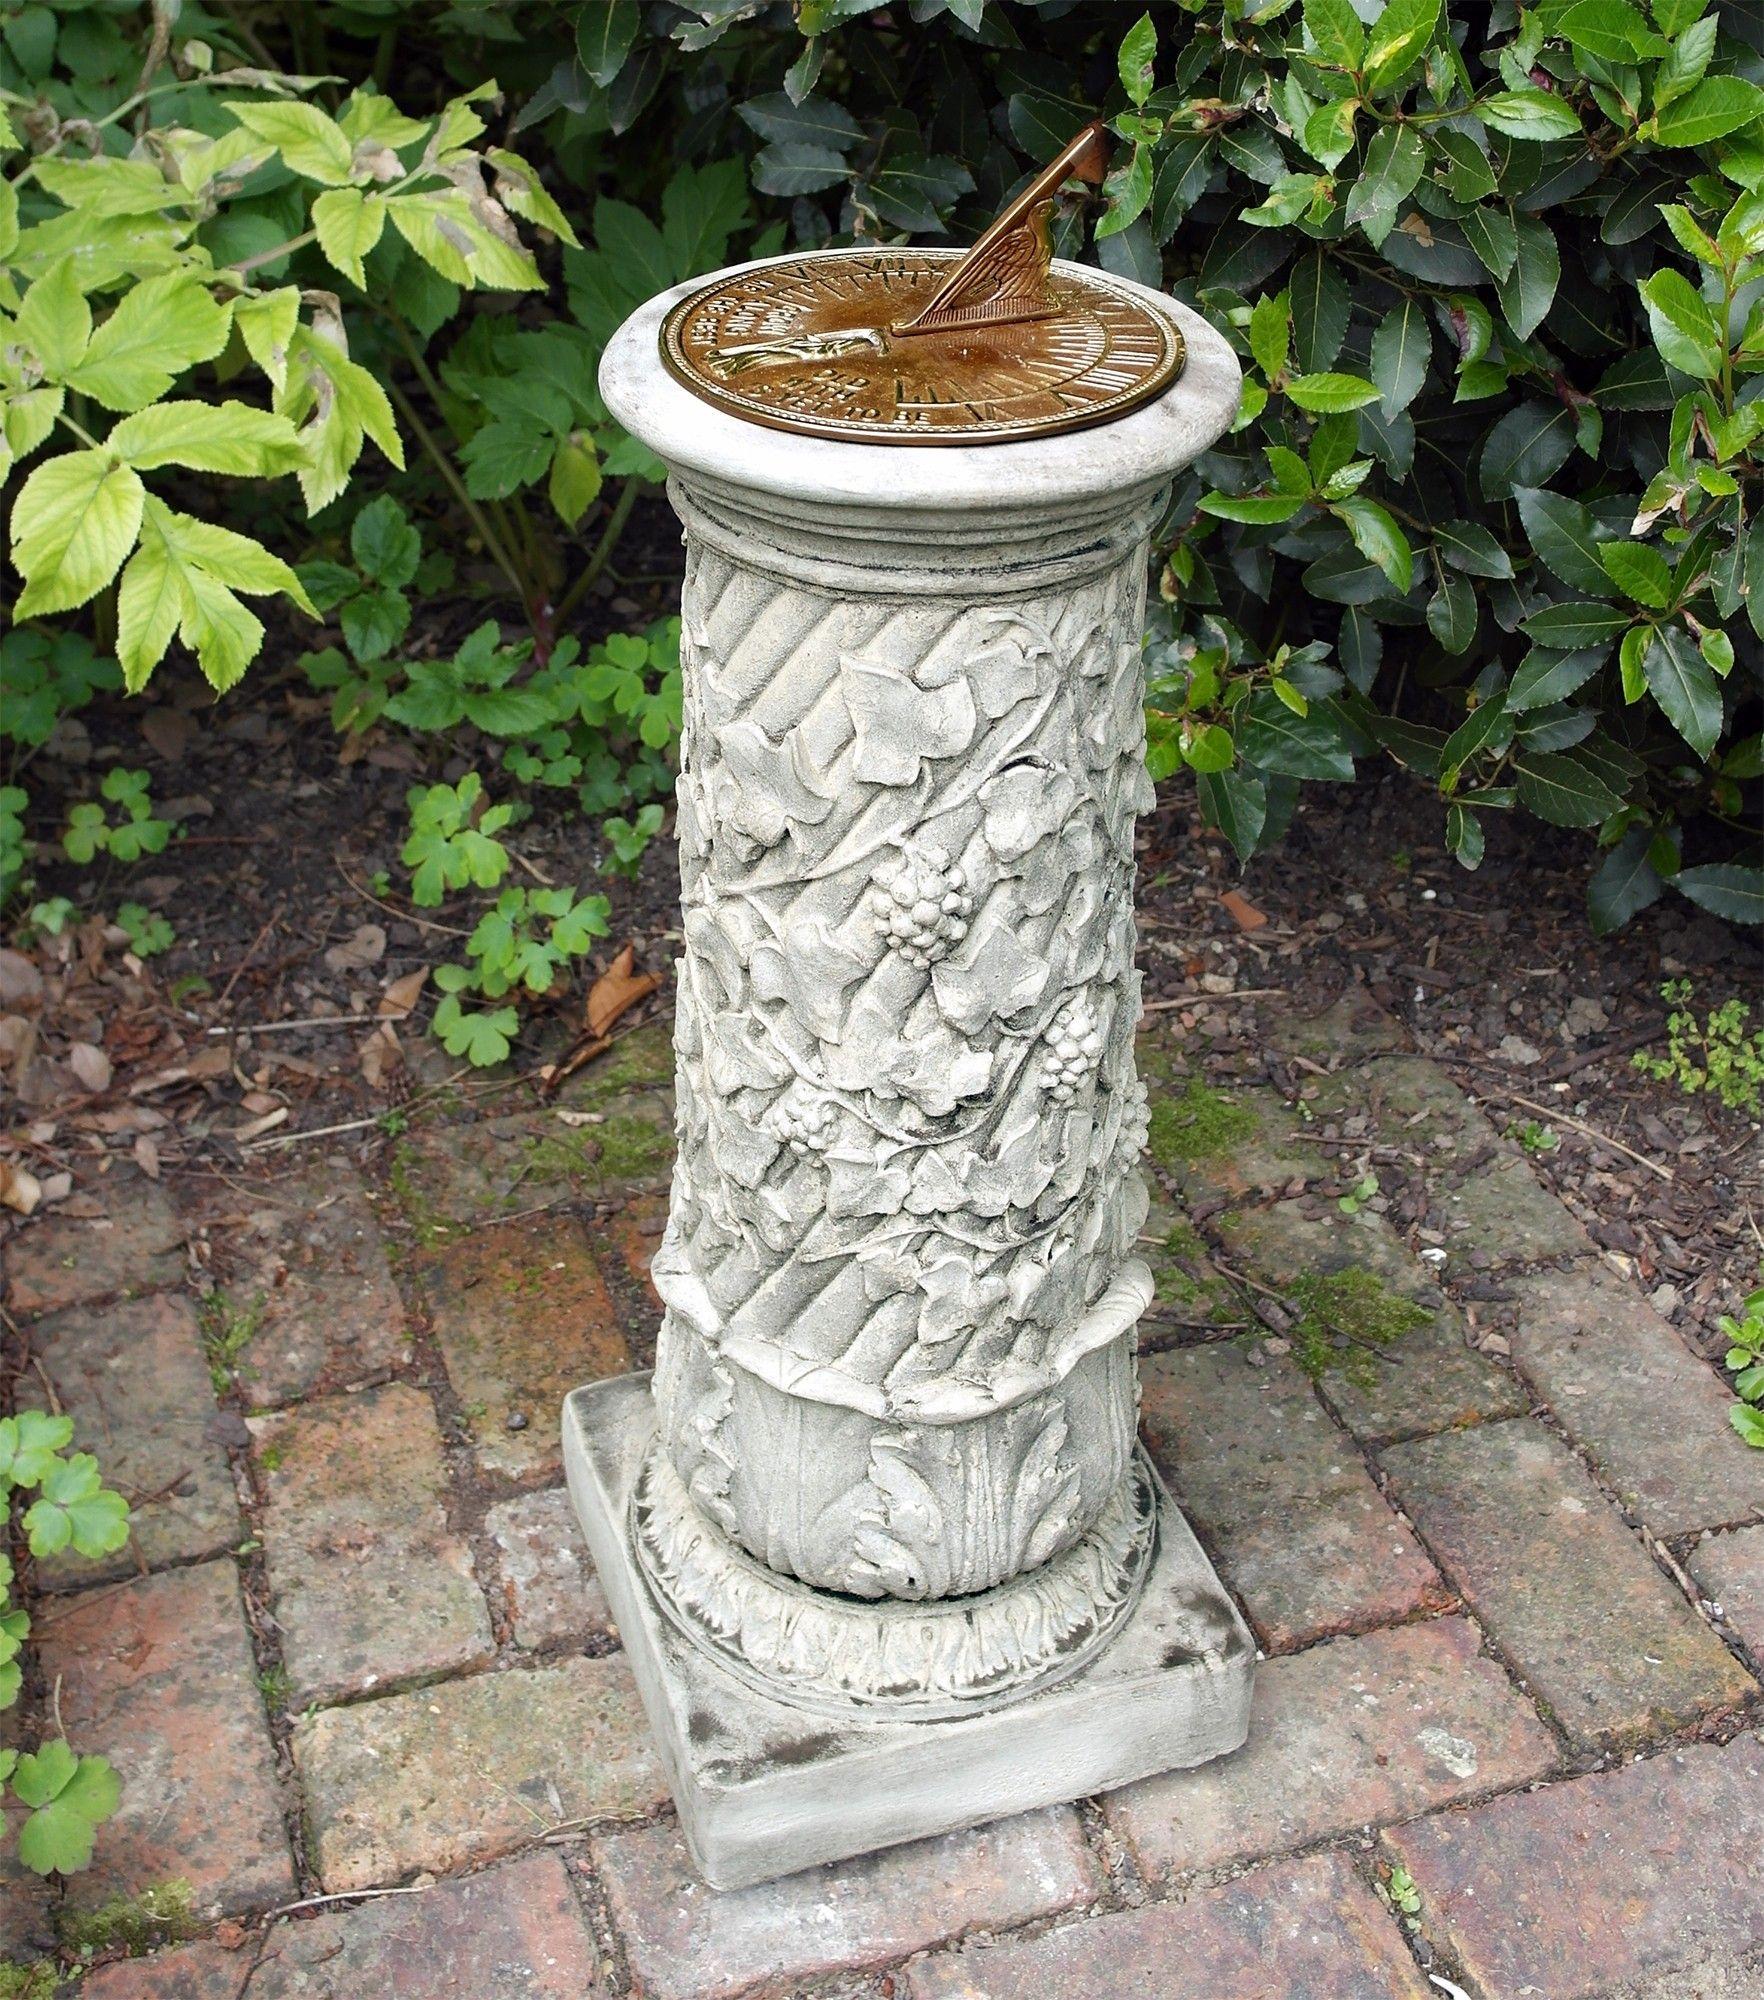 stone elegant of awesome pedestal sun garden com victorian lawsonreport dial sundial aged brass